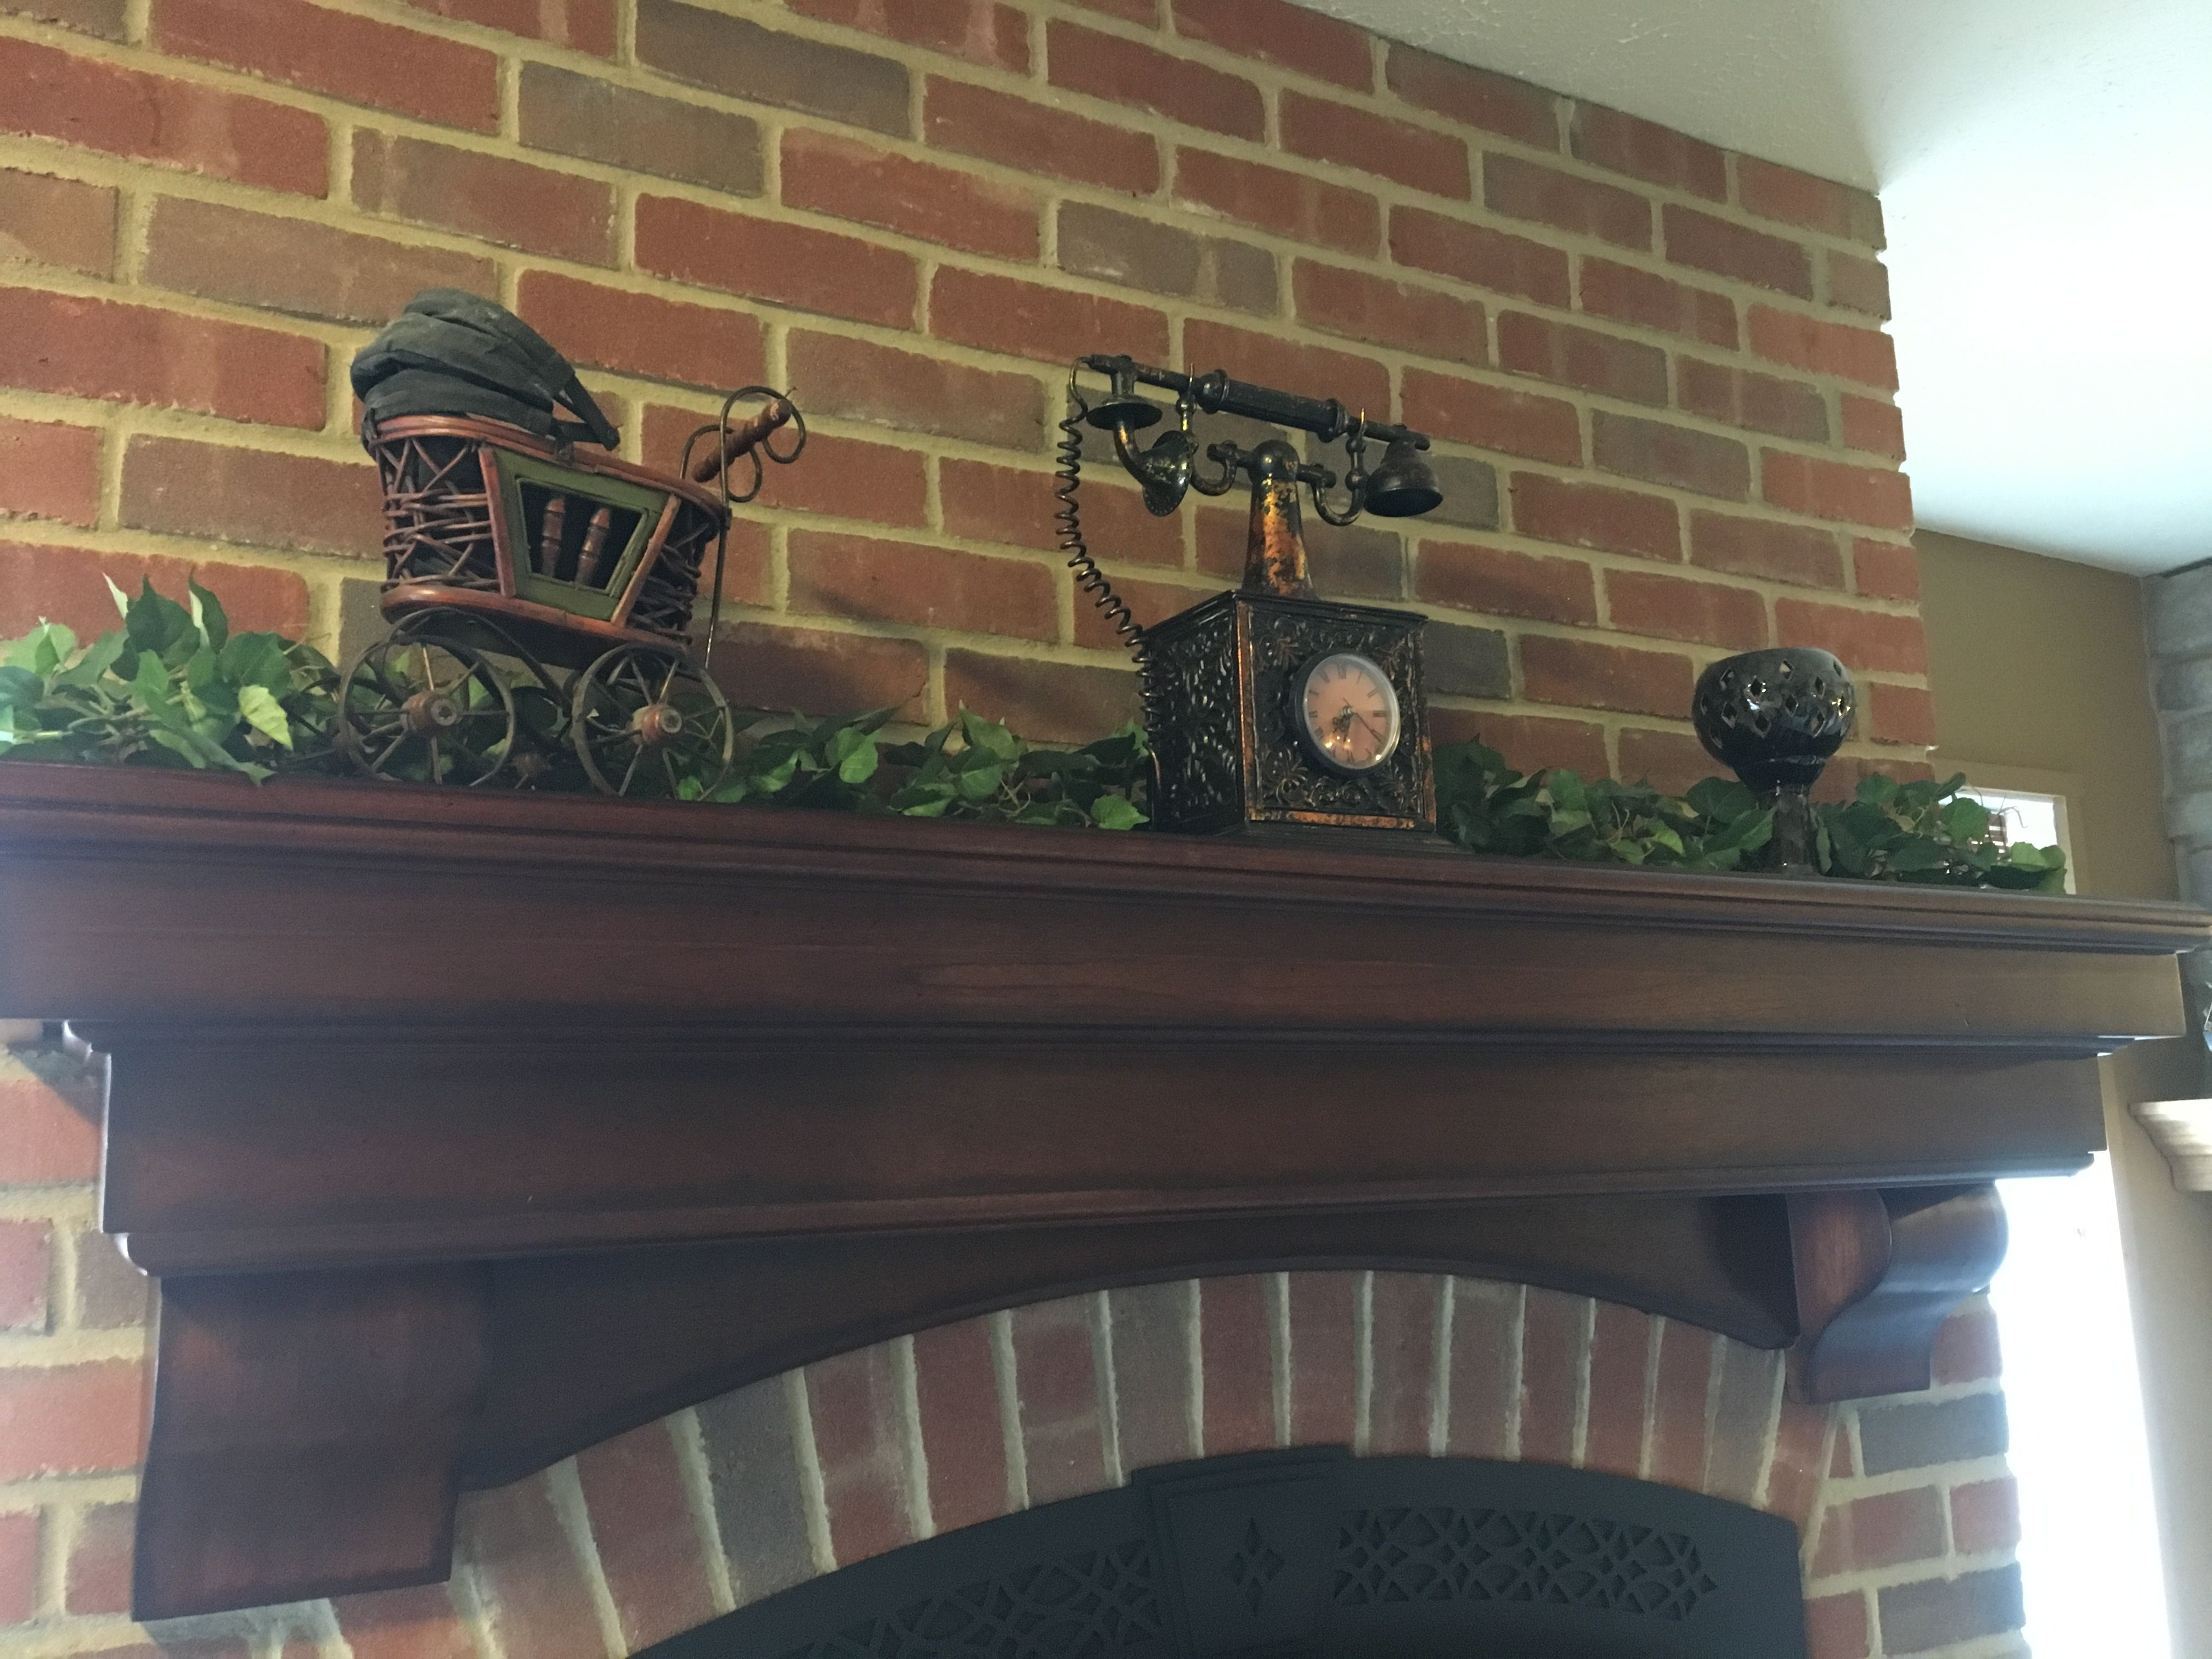 Pin by JCS Fireplace on Mantels | Pinterest